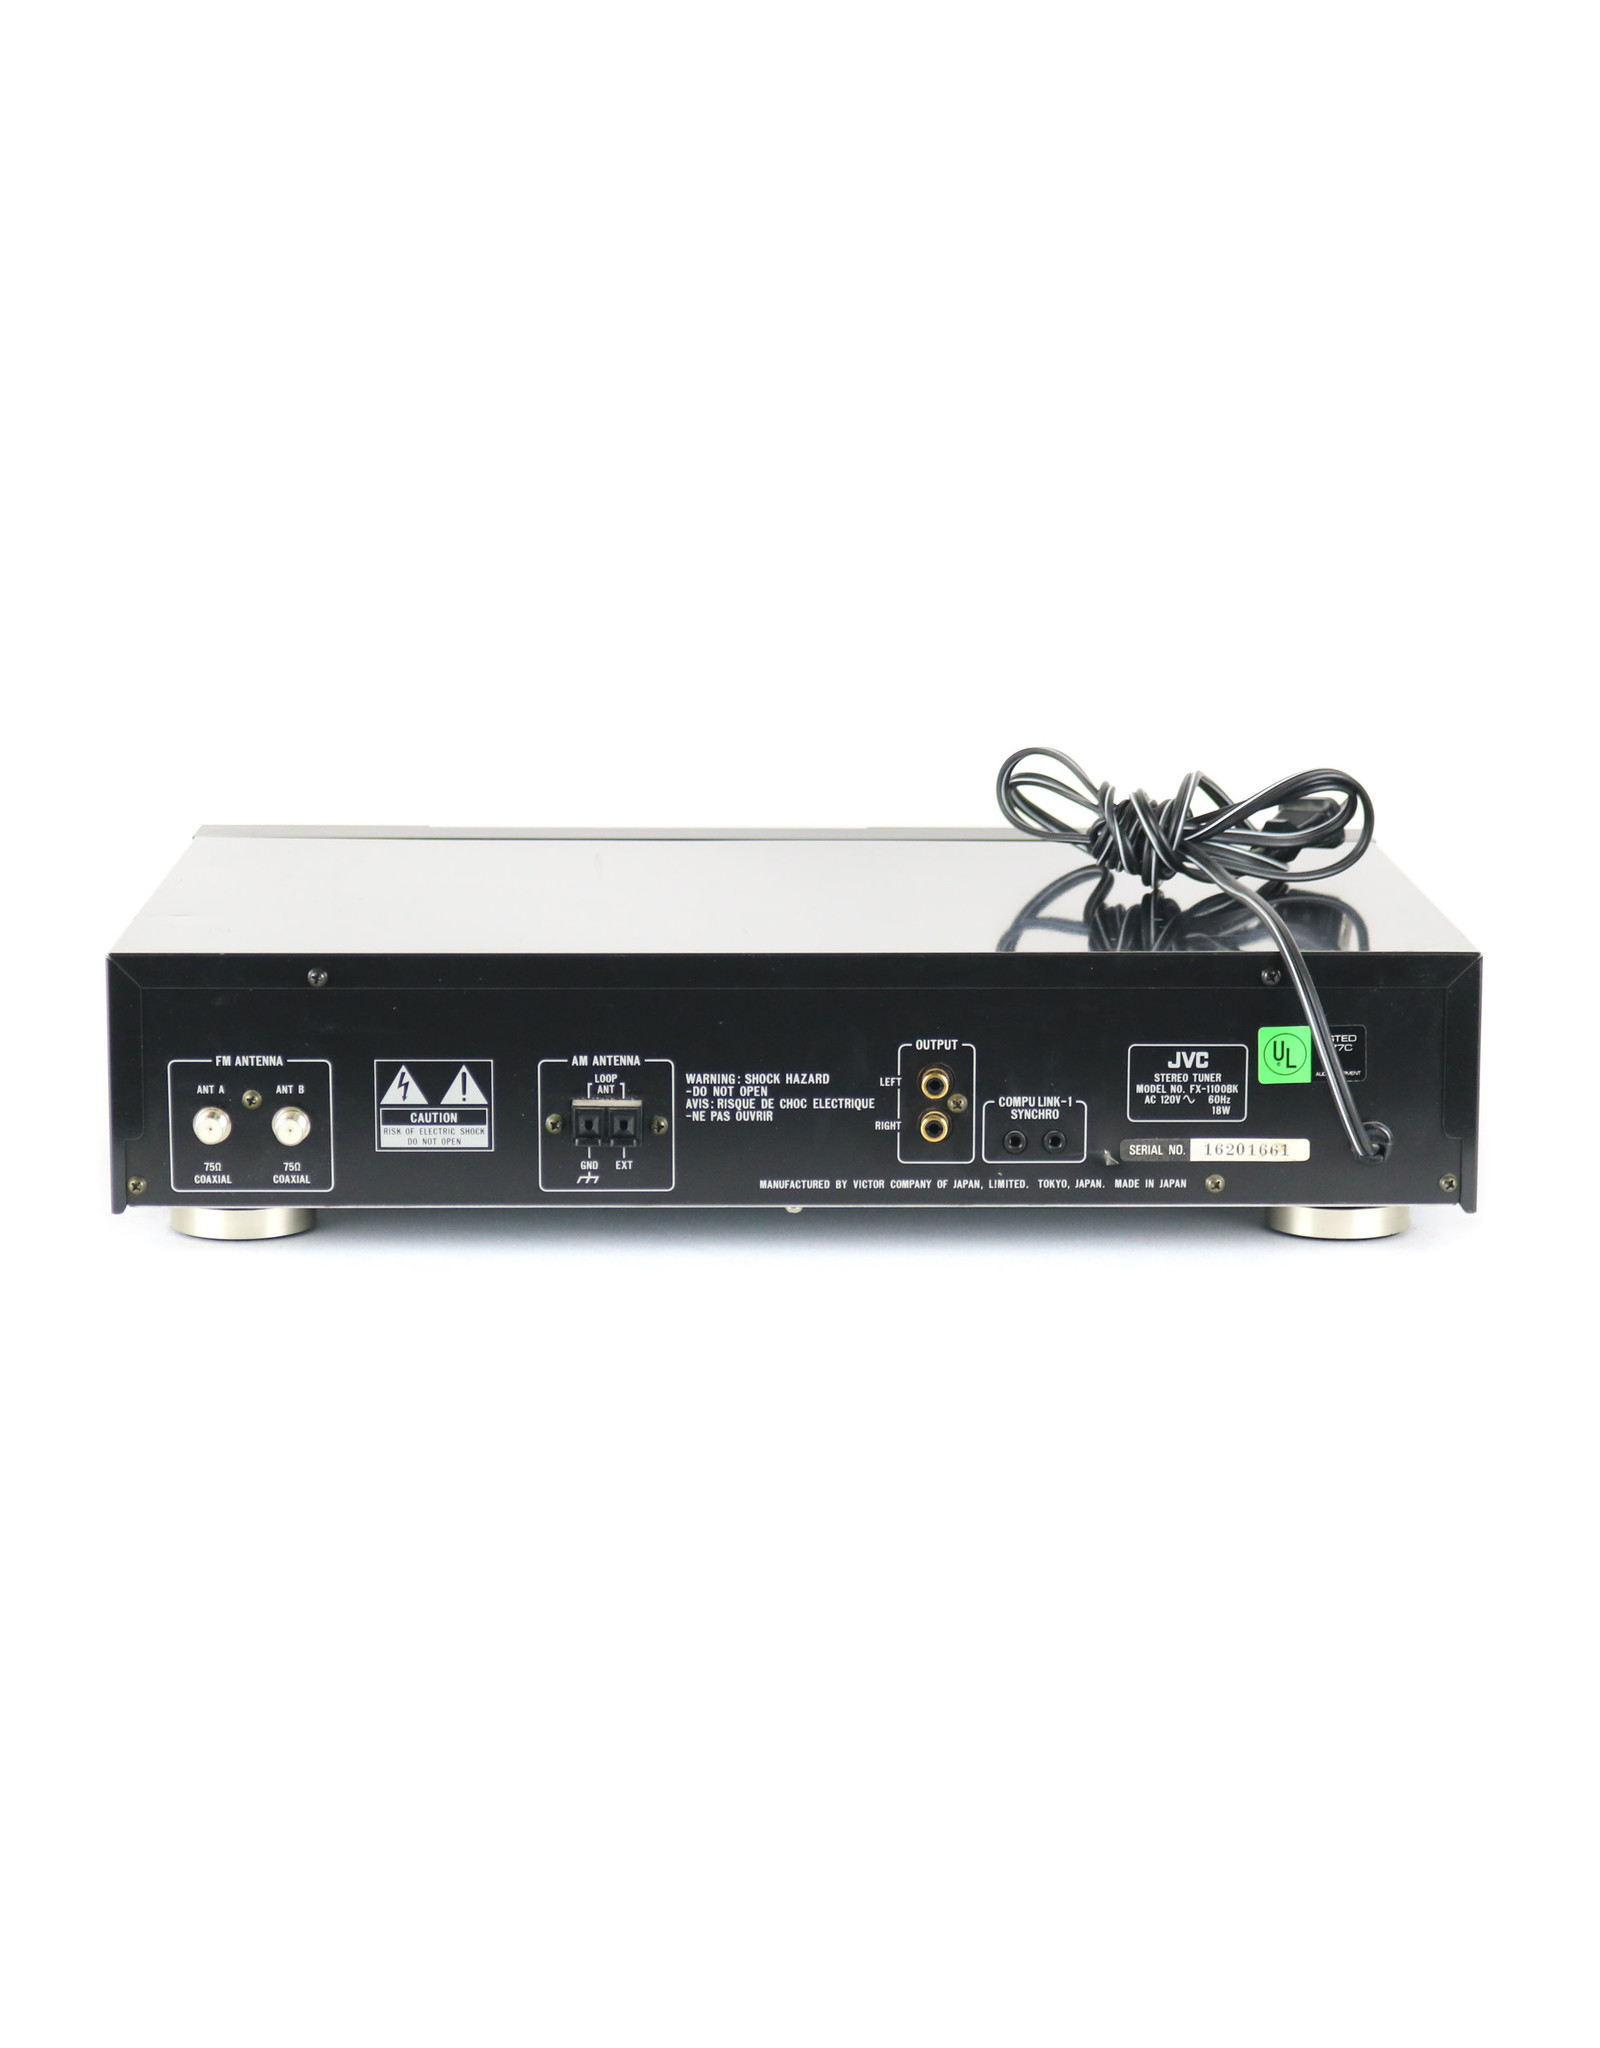 JVC JVC FX-1100 Tuner USED